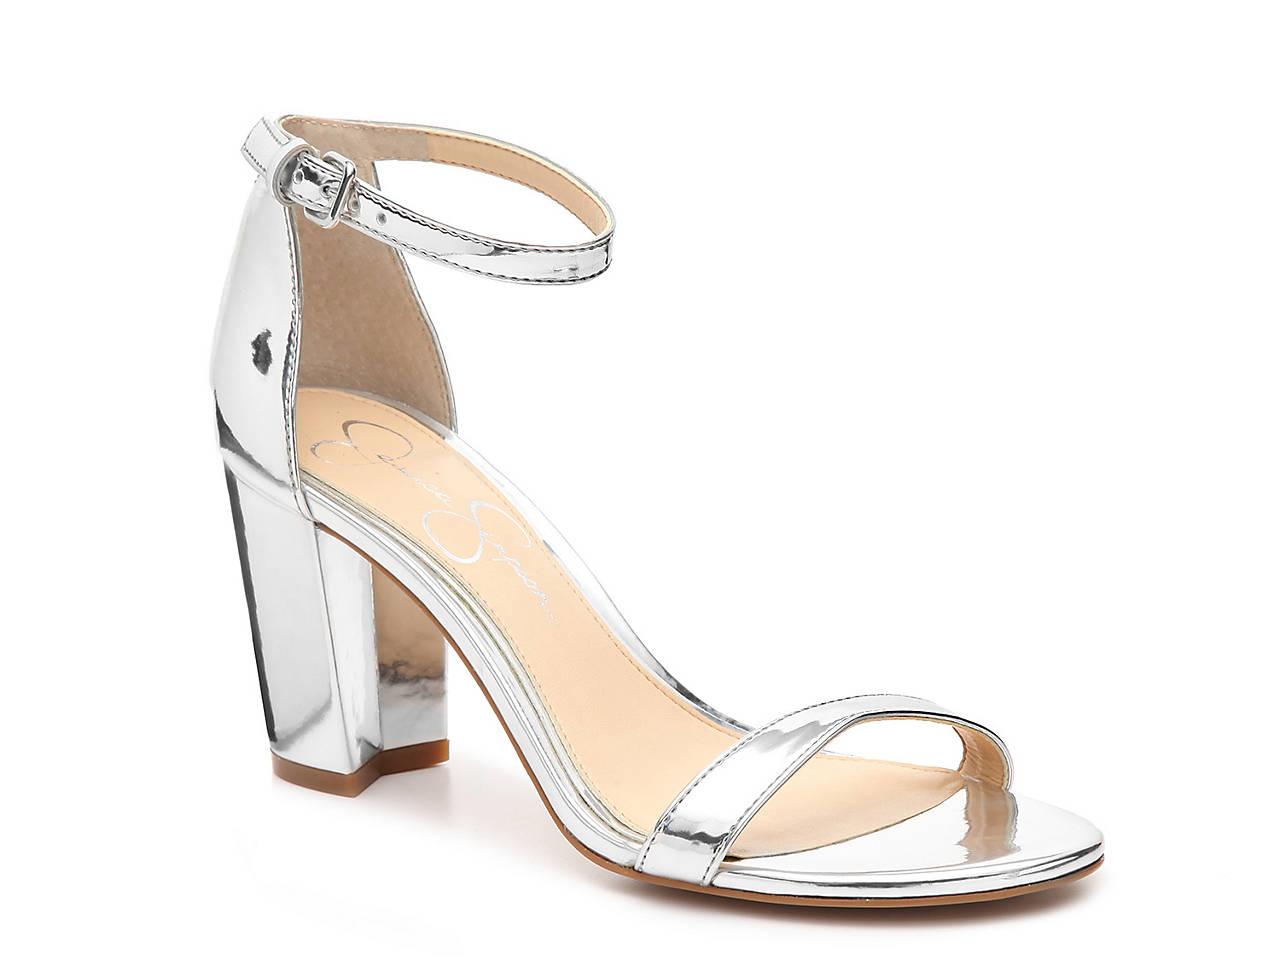 9a7bd250331 Jessica Simpson Monrae Sandal Women s Shoes